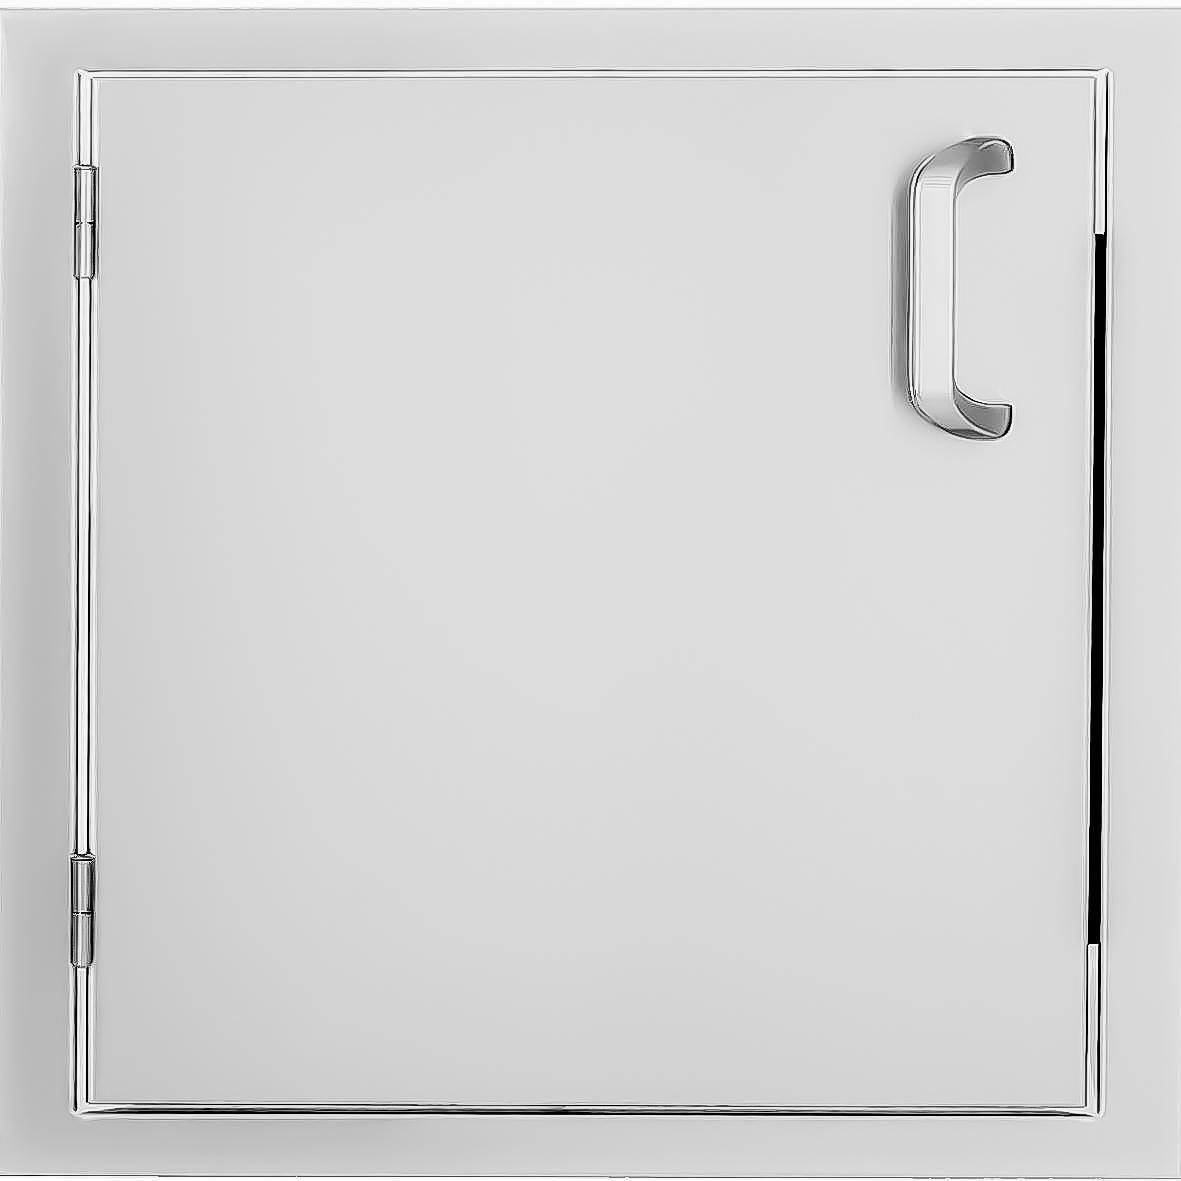 BBQGUYS Kingston Series 21-Inch Stainless Steel Left-Hinged Single Access Door